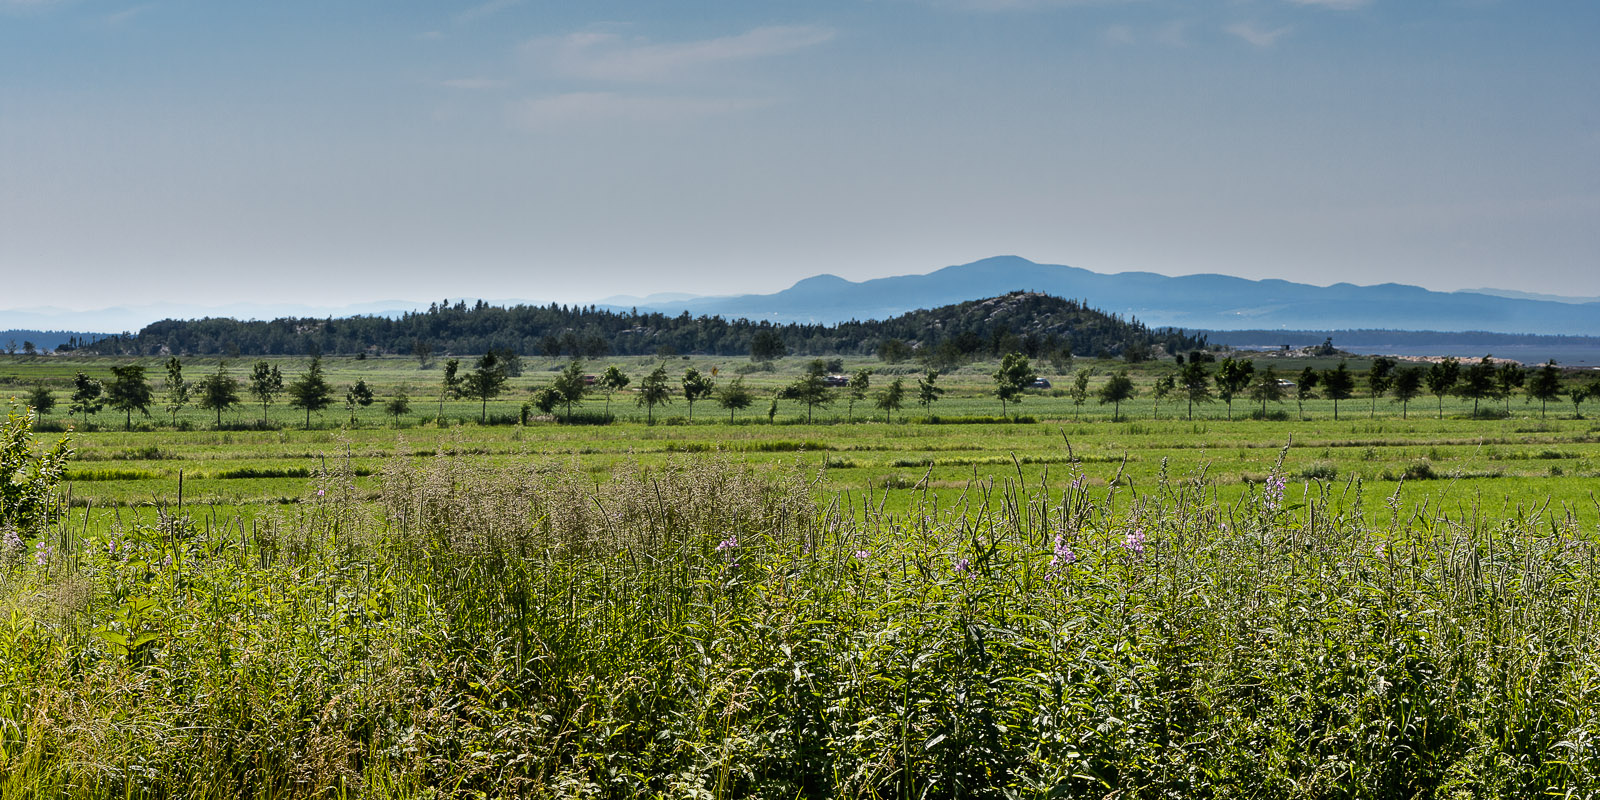 Vue du paysage champêtre environnant la micro-brasserie Brughel